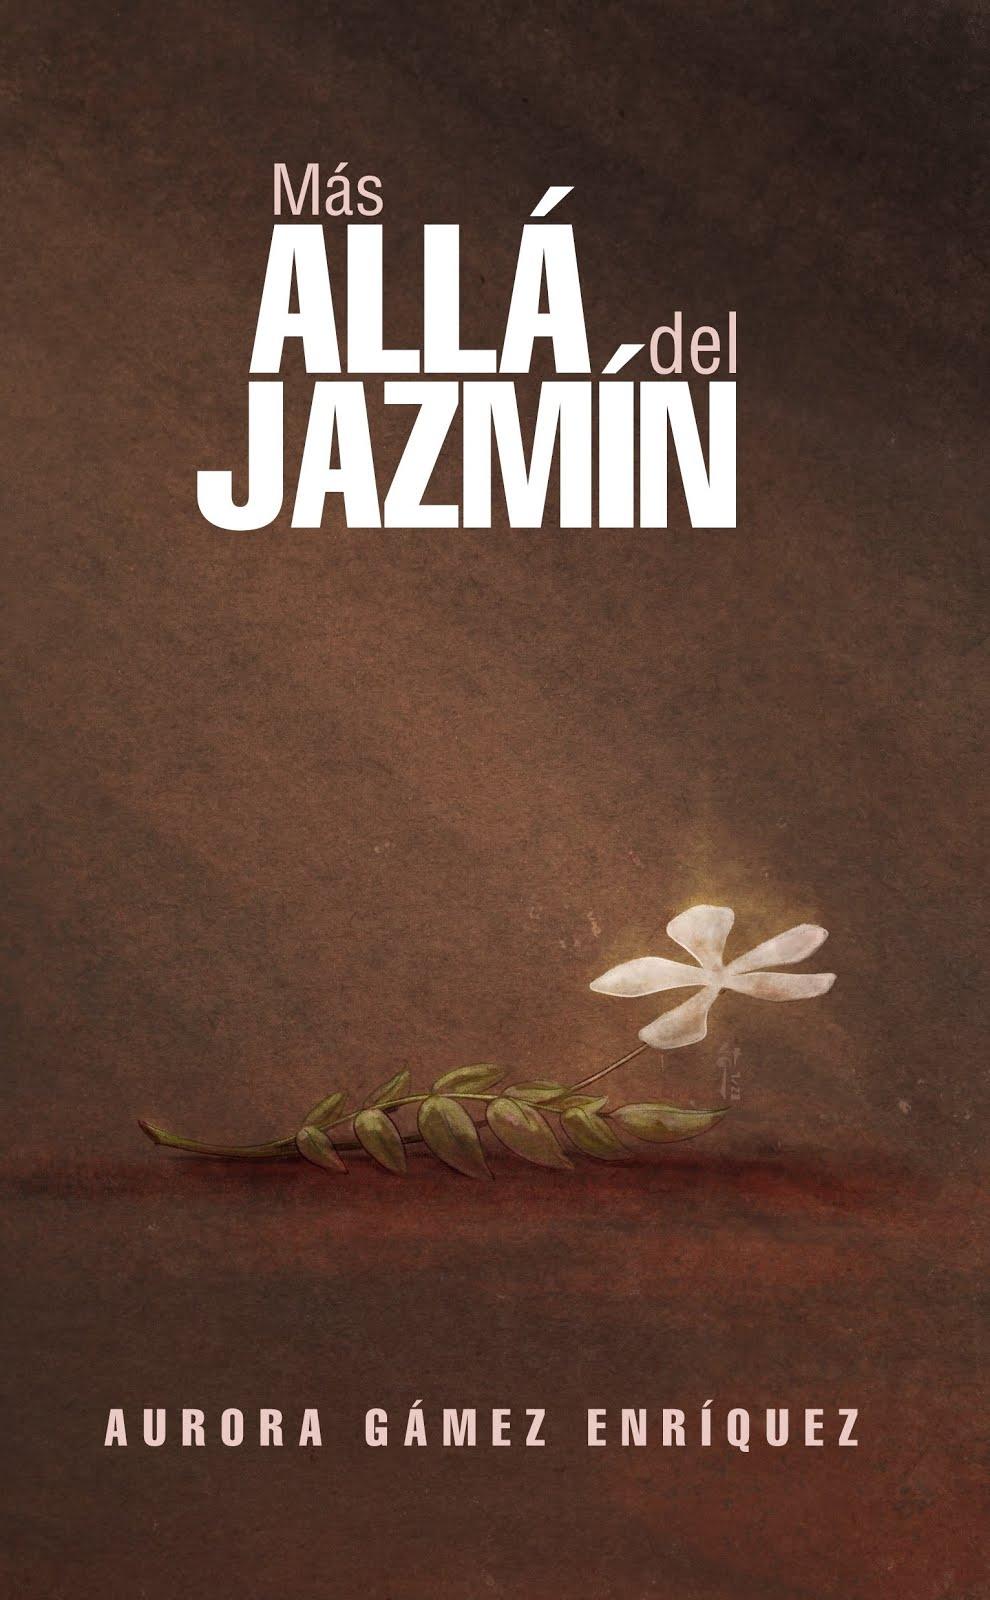 MÁS ALLÁ DEL JAZMÍN -poesía- Aurora Gámez Enríquez